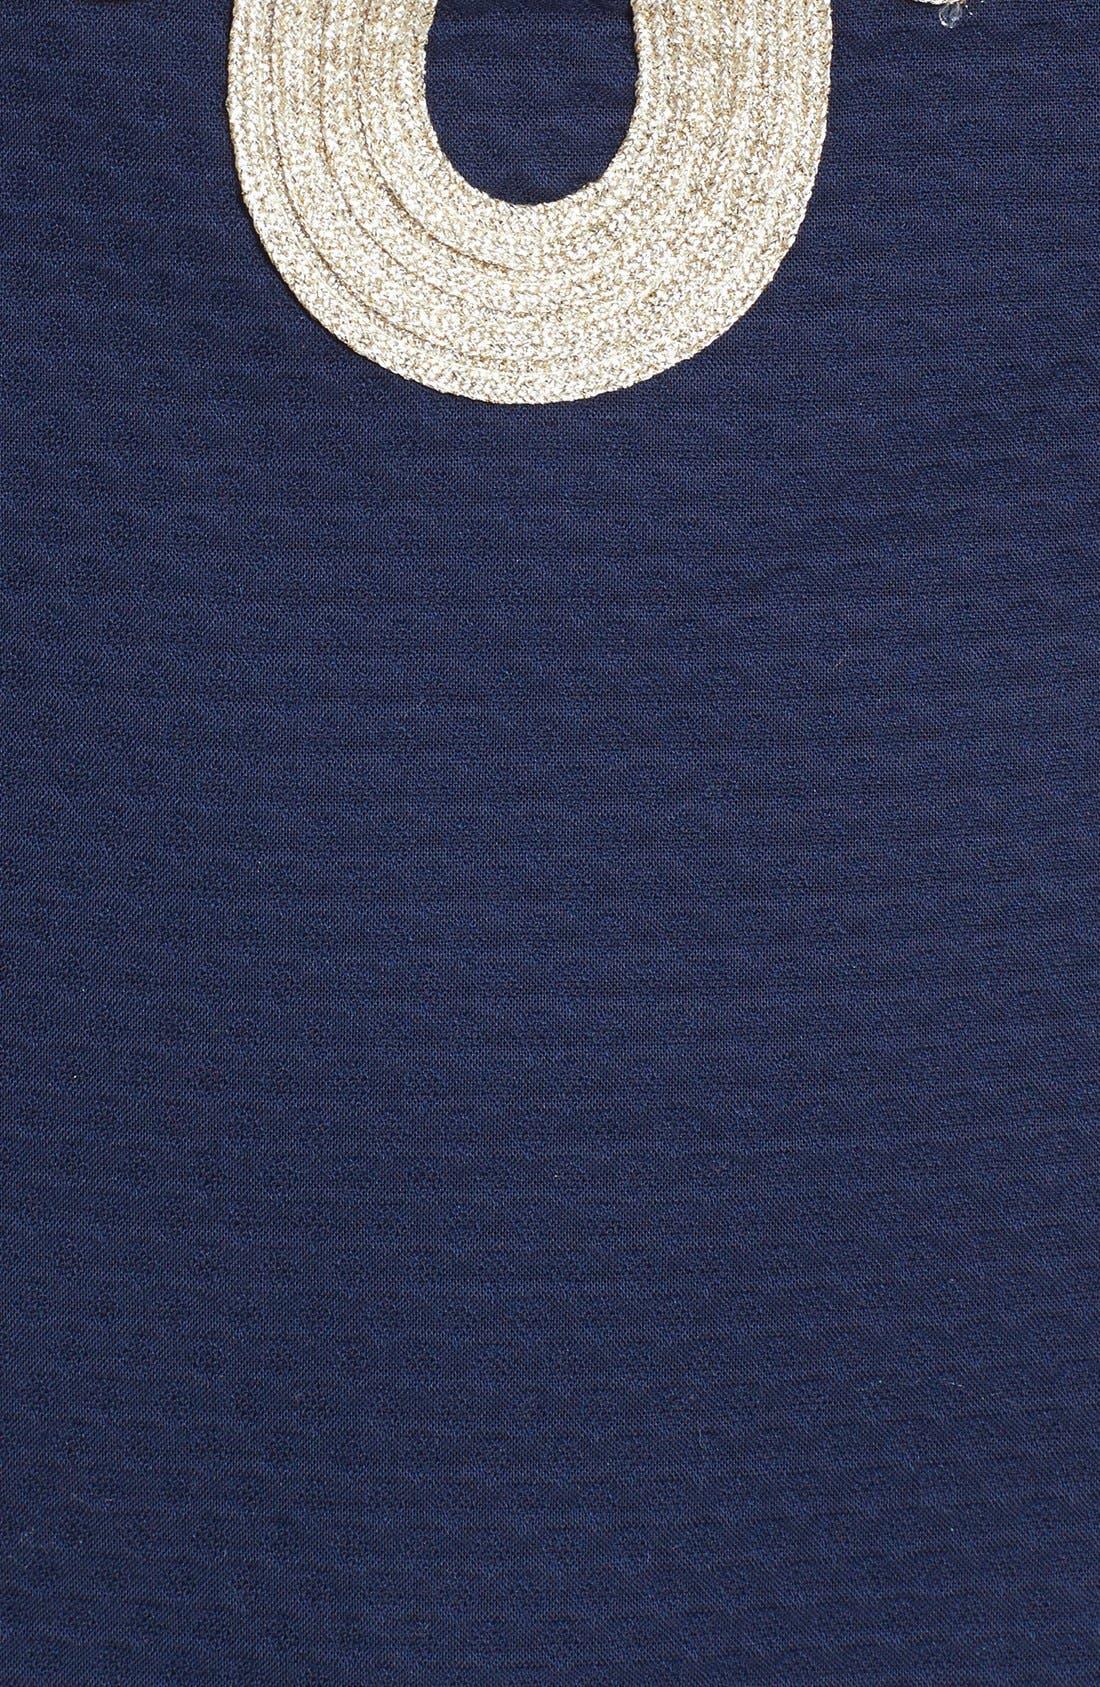 Alternate Image 4  - Lilly Pulitzer® 'Janice' Soutache Cotton Shift Dress